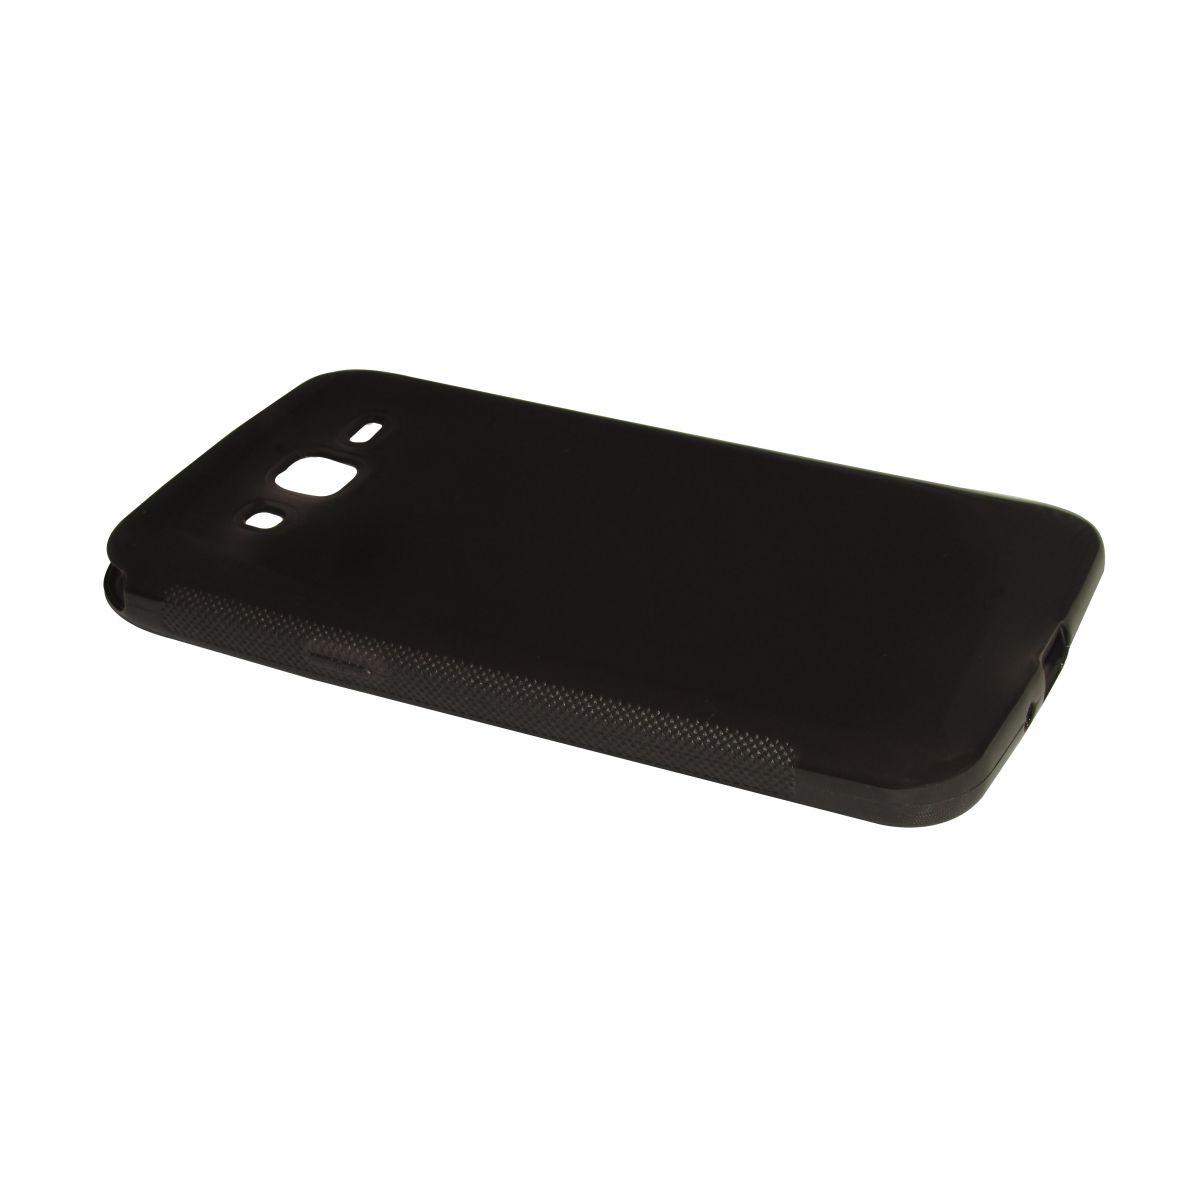 Capa de TPU Samsung Galaxy Gran Duos 2 G7102 G7106  Pelicula Grafite